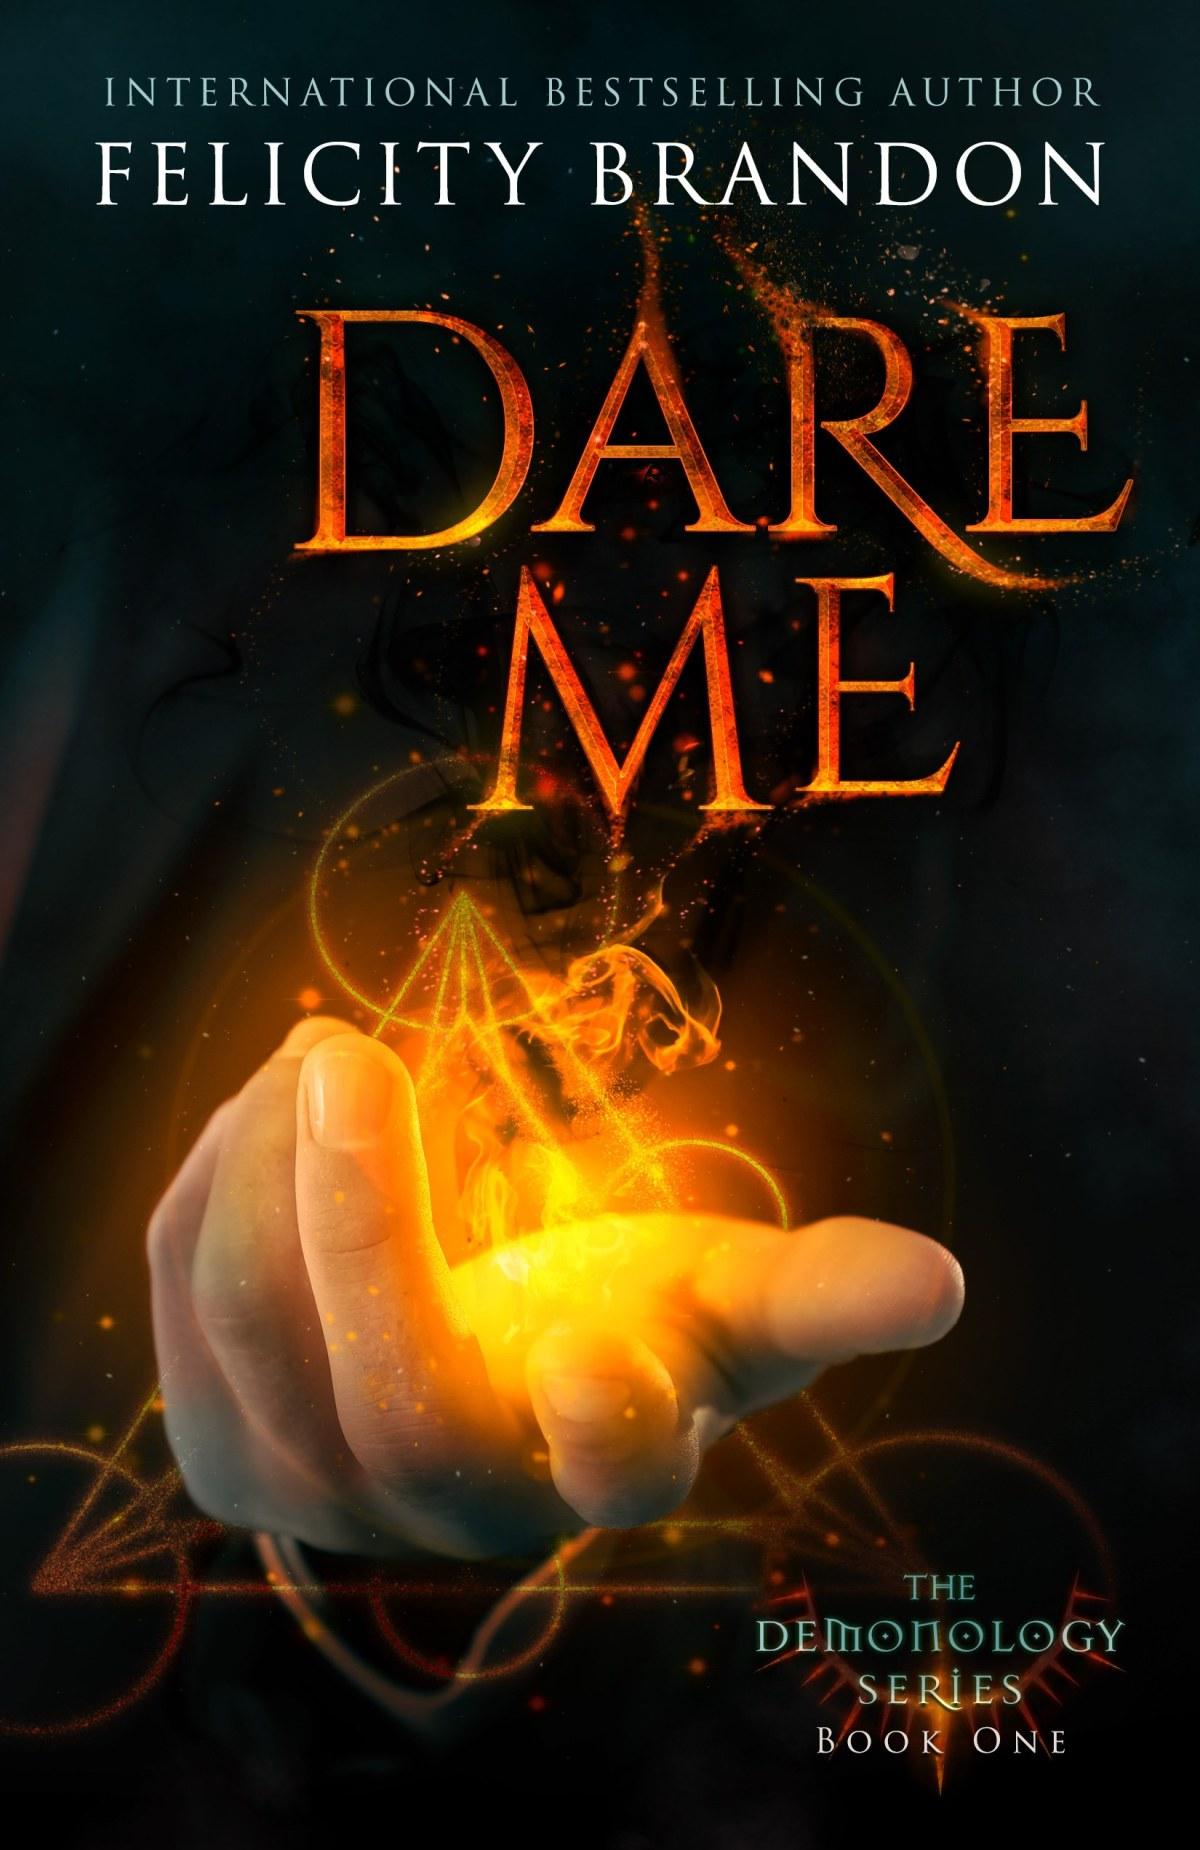 I Dare You to meetRaif…